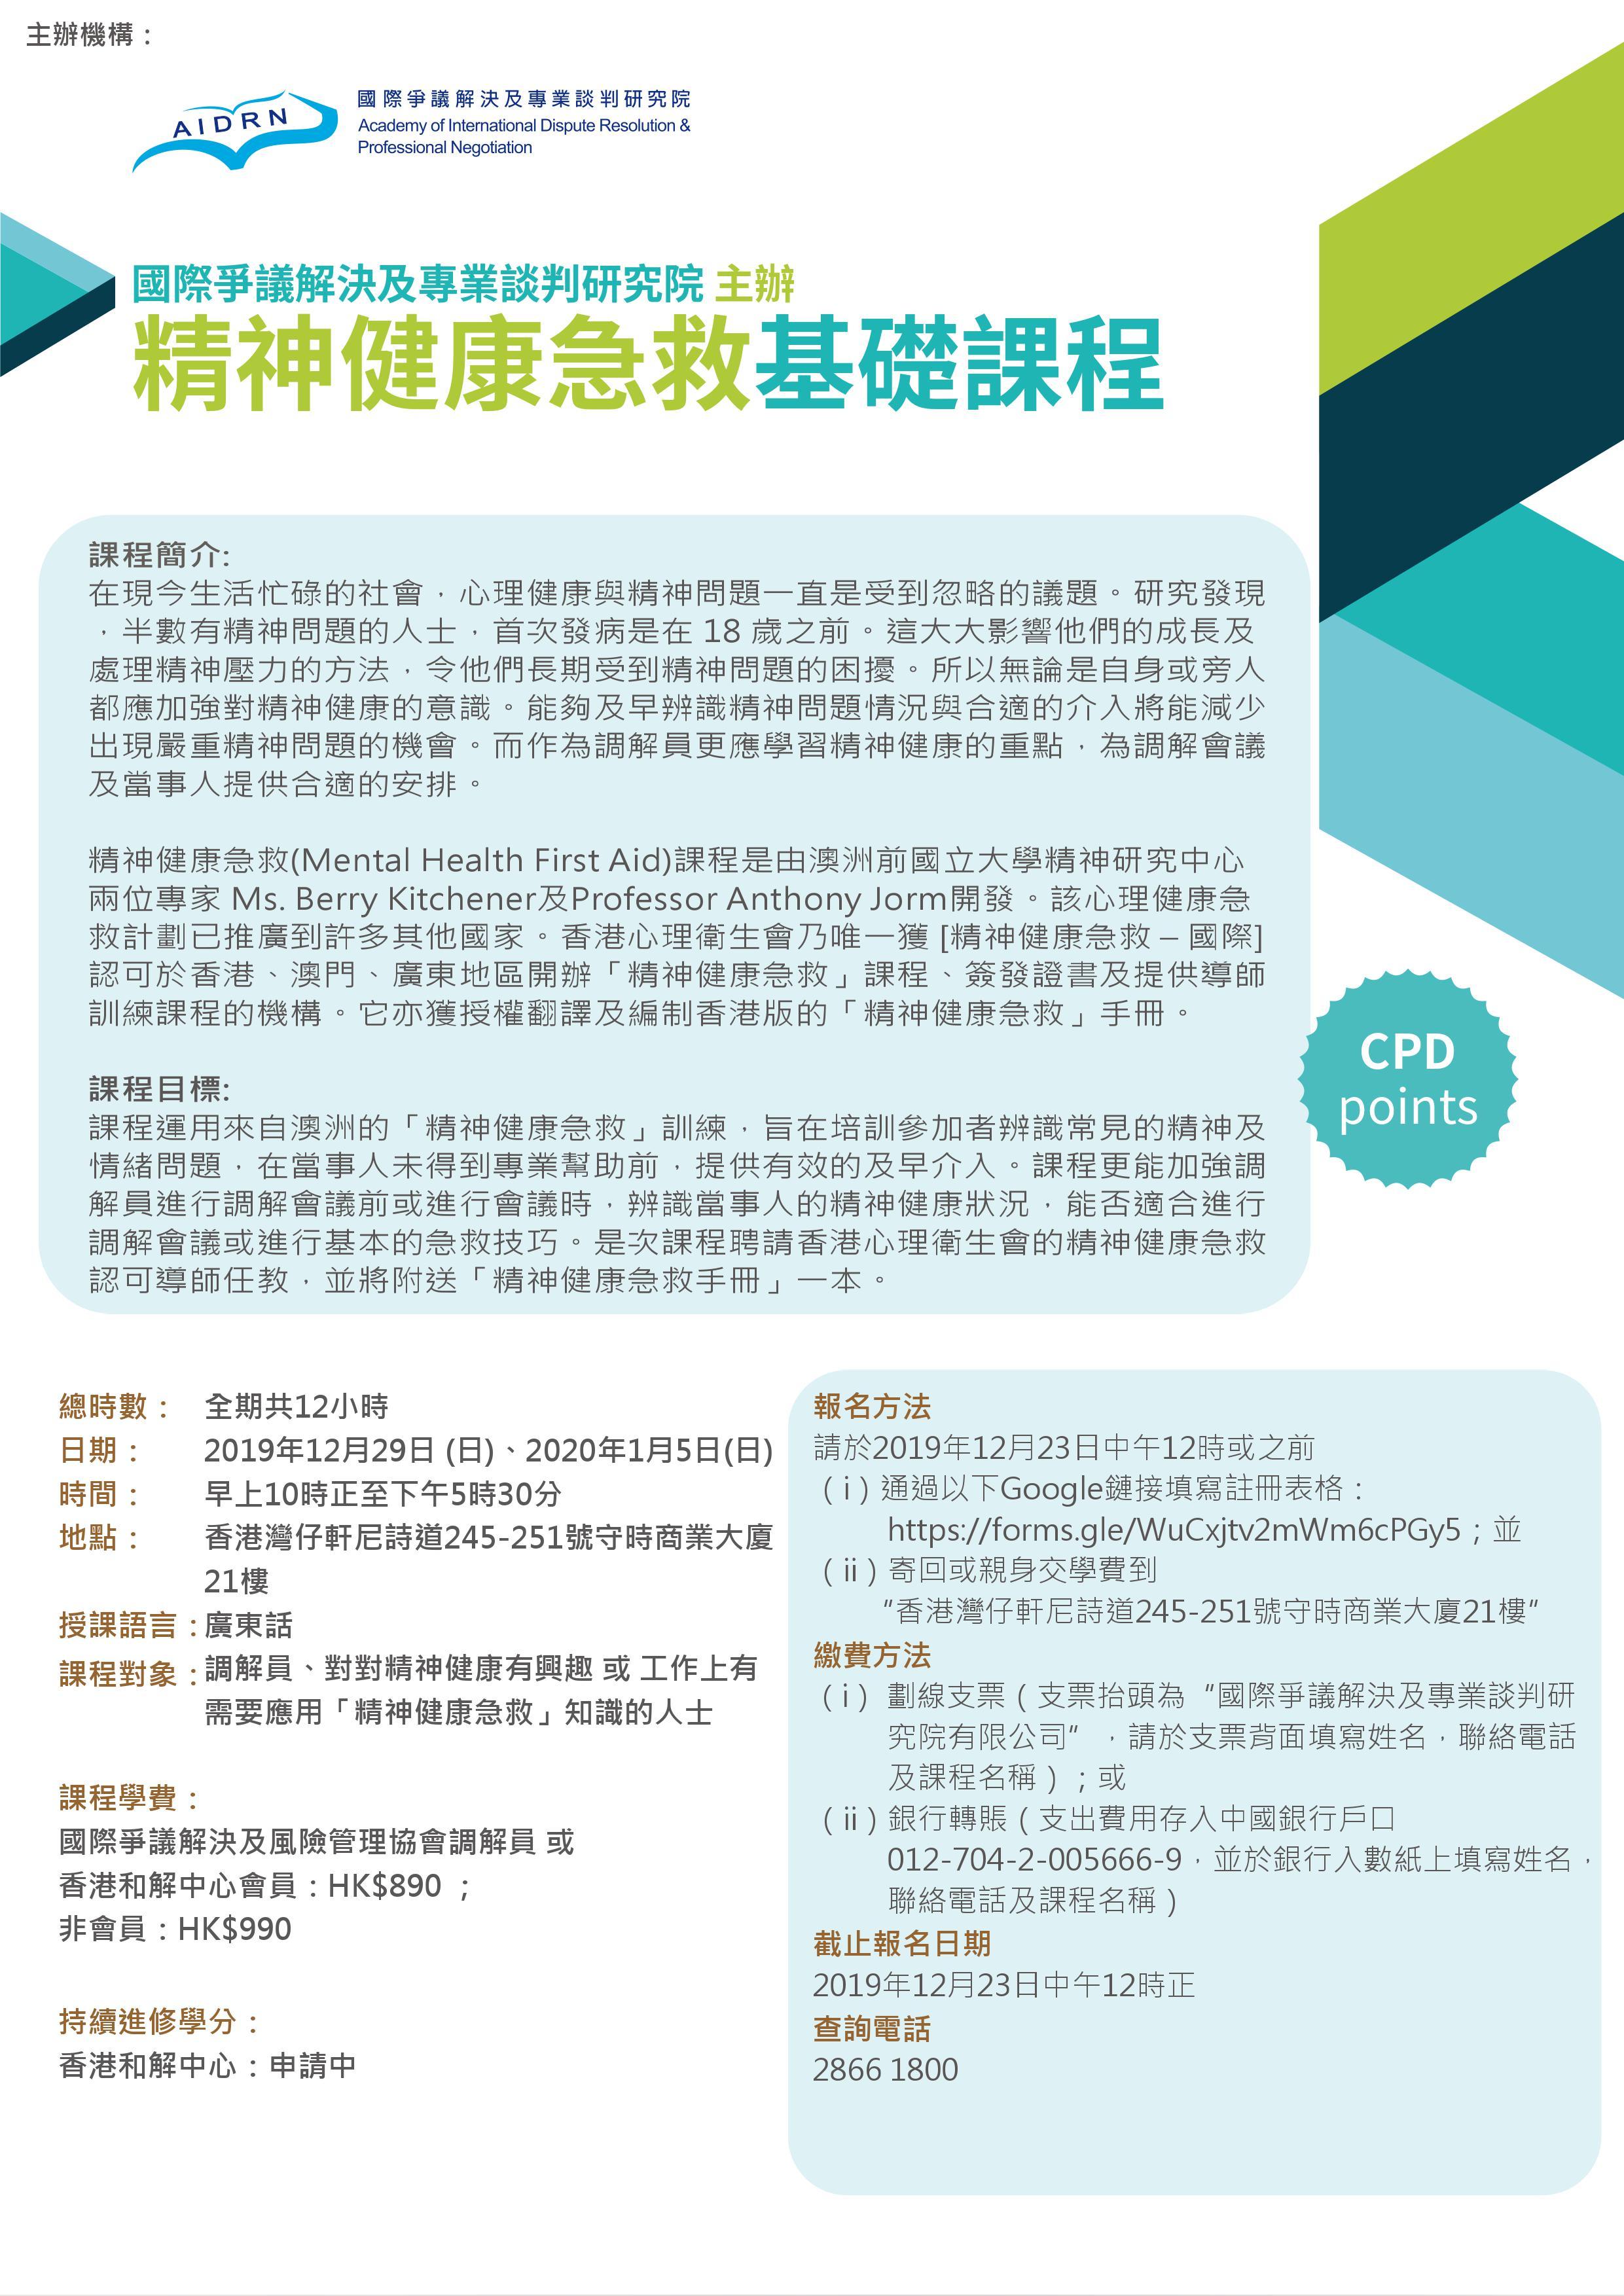 (Dec2019) 精神健康急救基礎課程Flyer p1